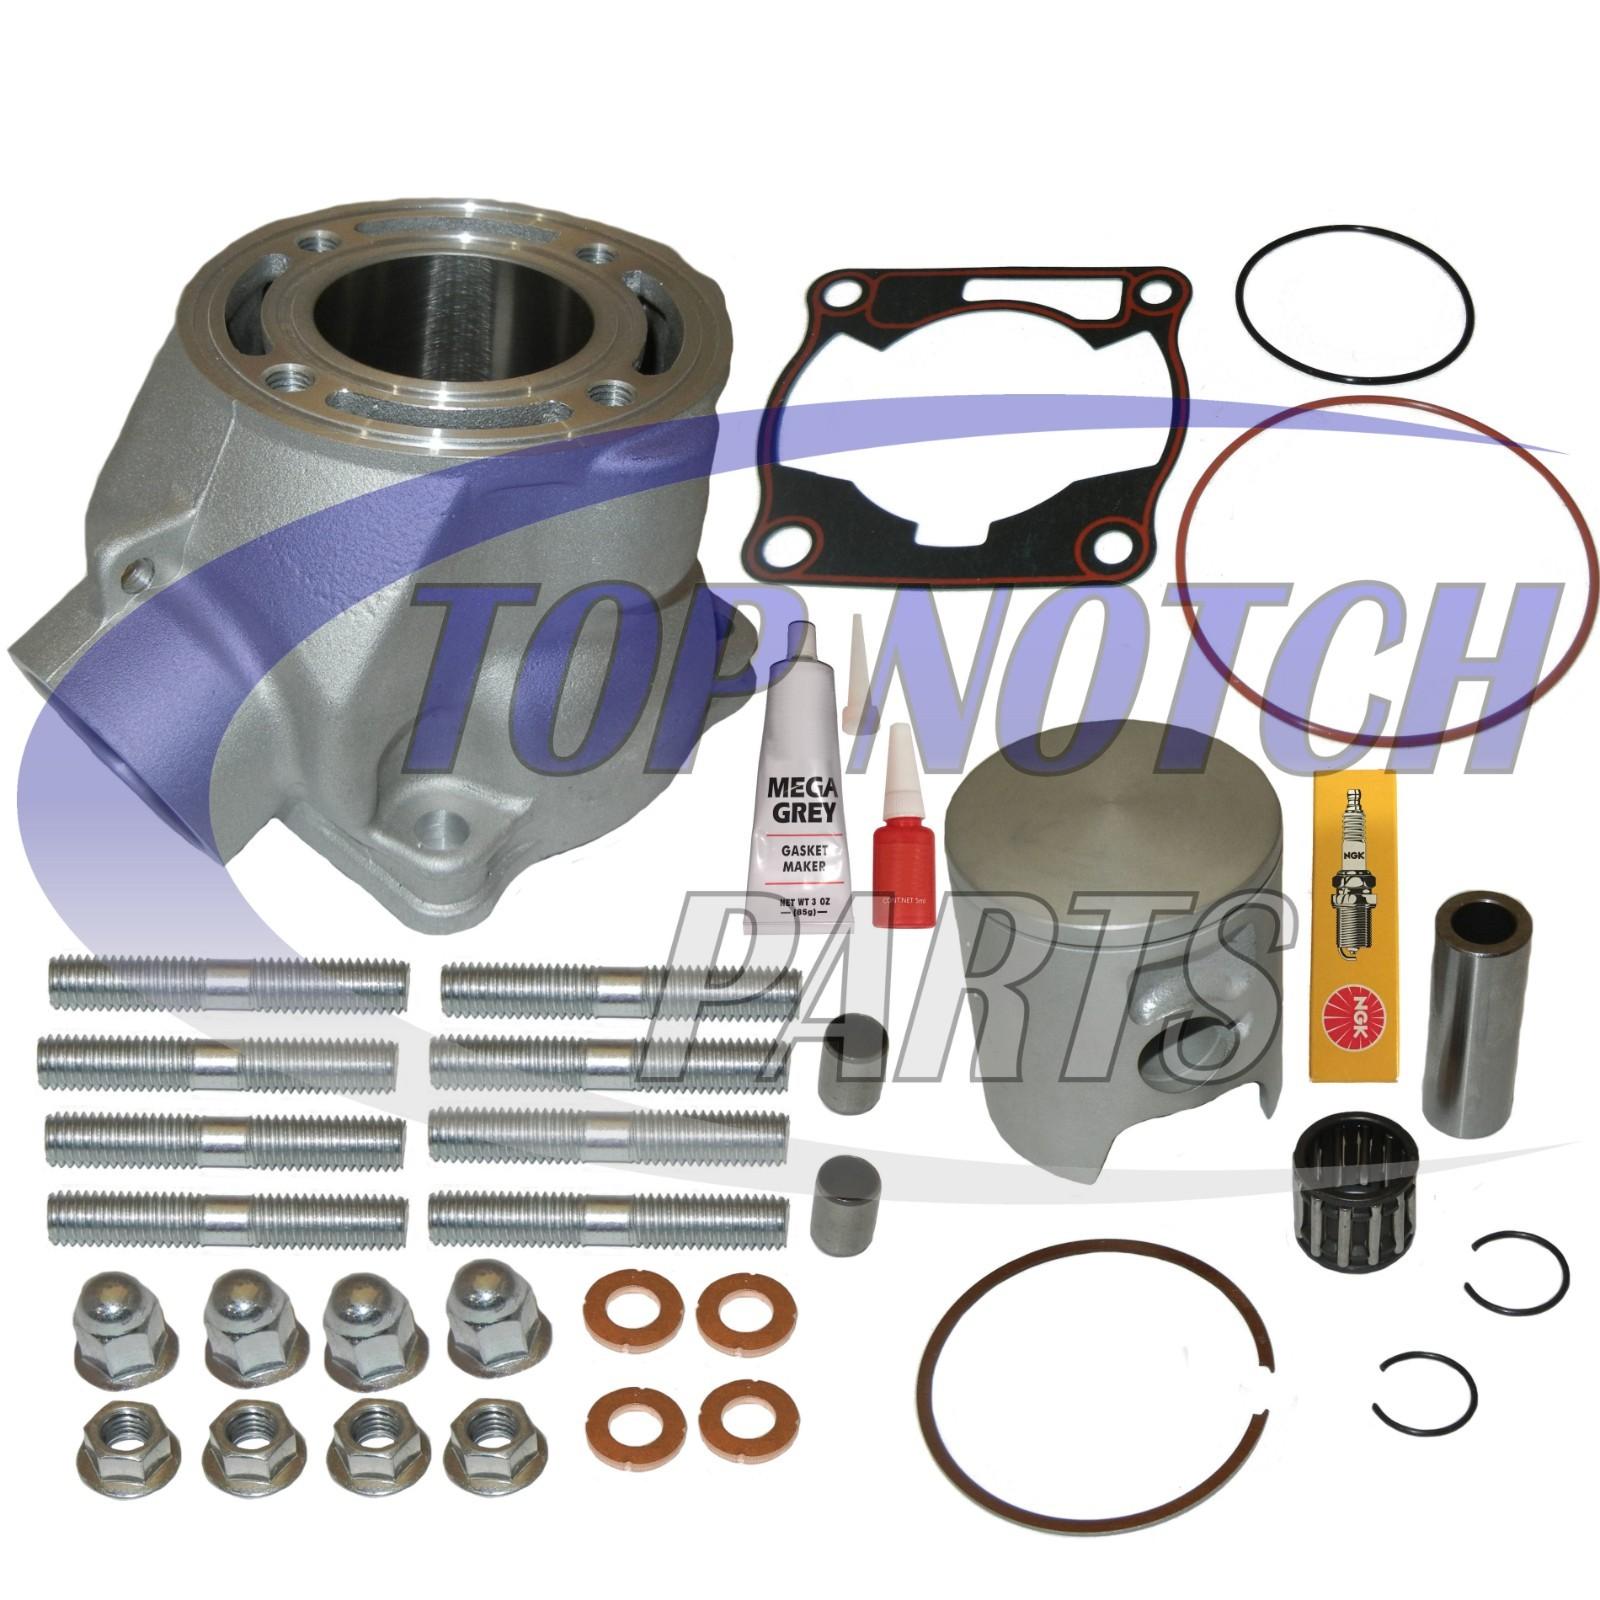 FOR Yamaha YZ80 YZ 80 1993-2001 00 99 98 97 96 aluminum radiator